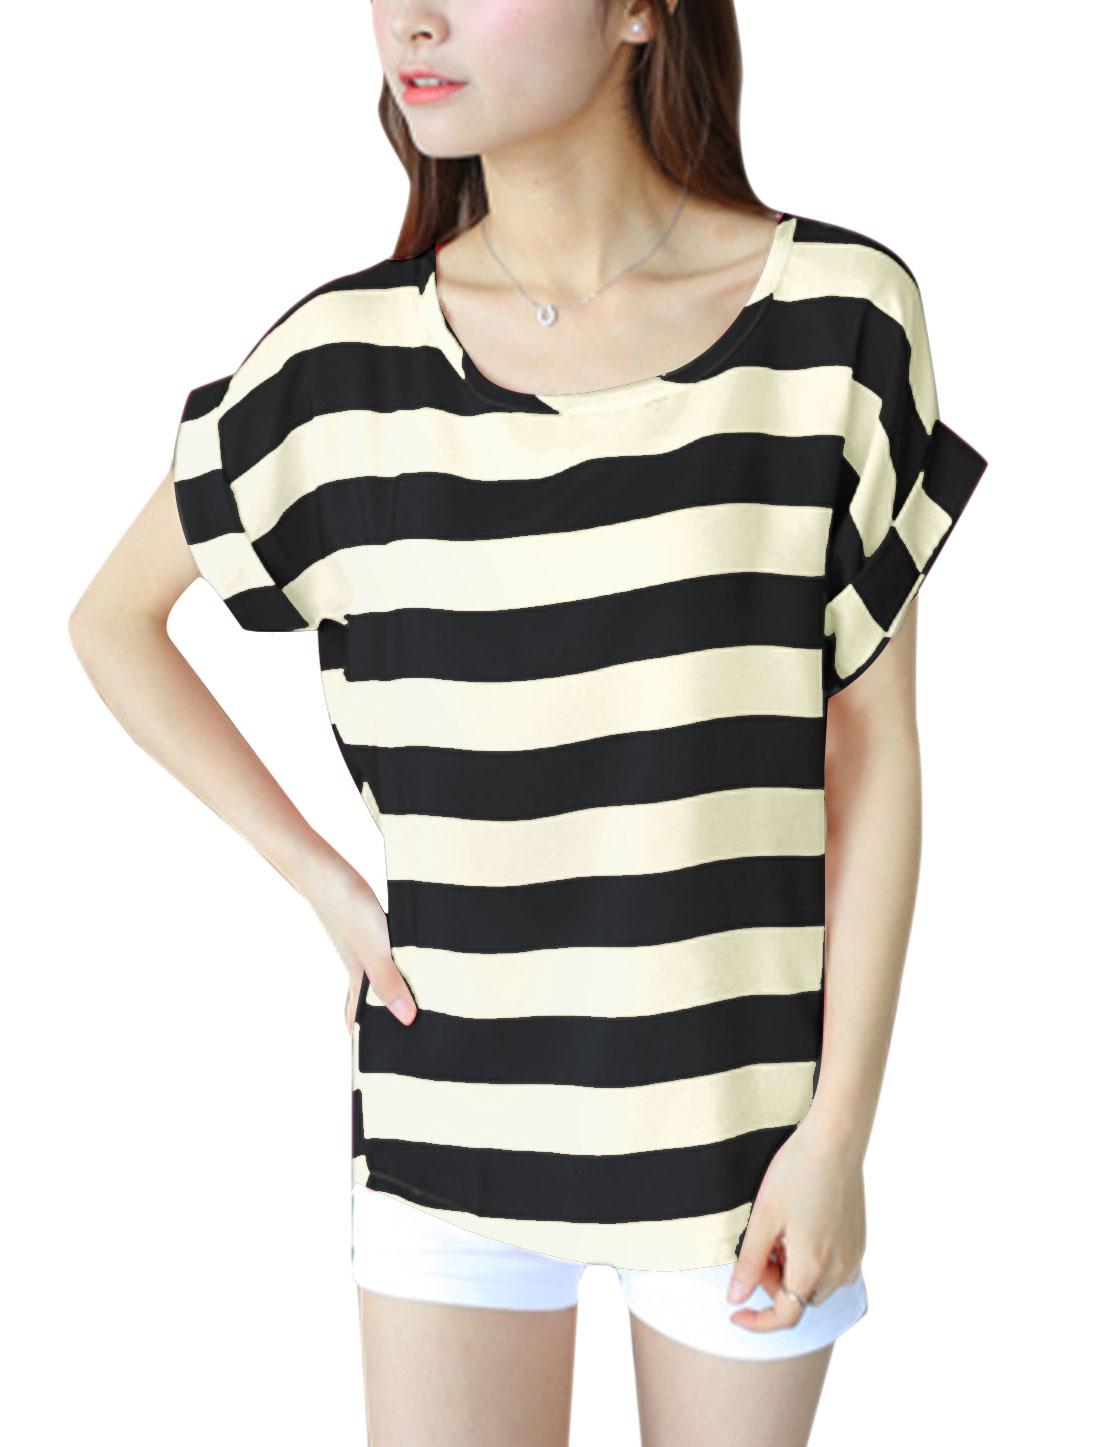 Lady U Neck Short Batwing Sleeve Stripes T-Shirt Black XS